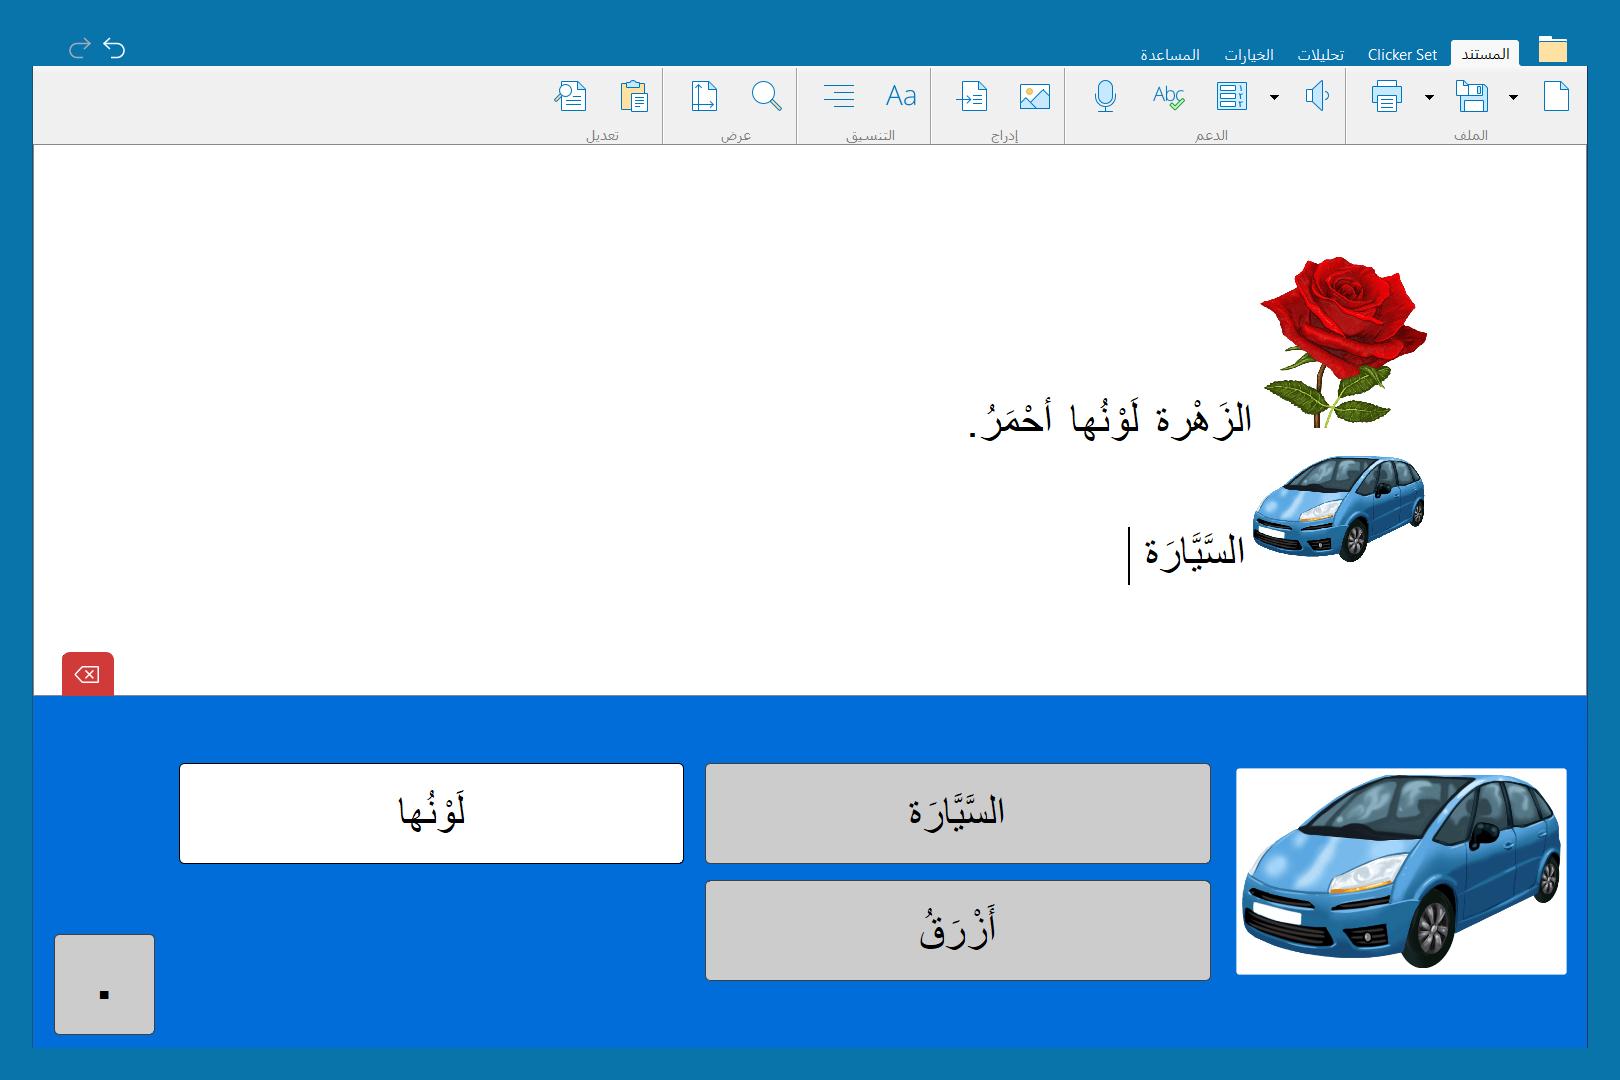 c8 arabic